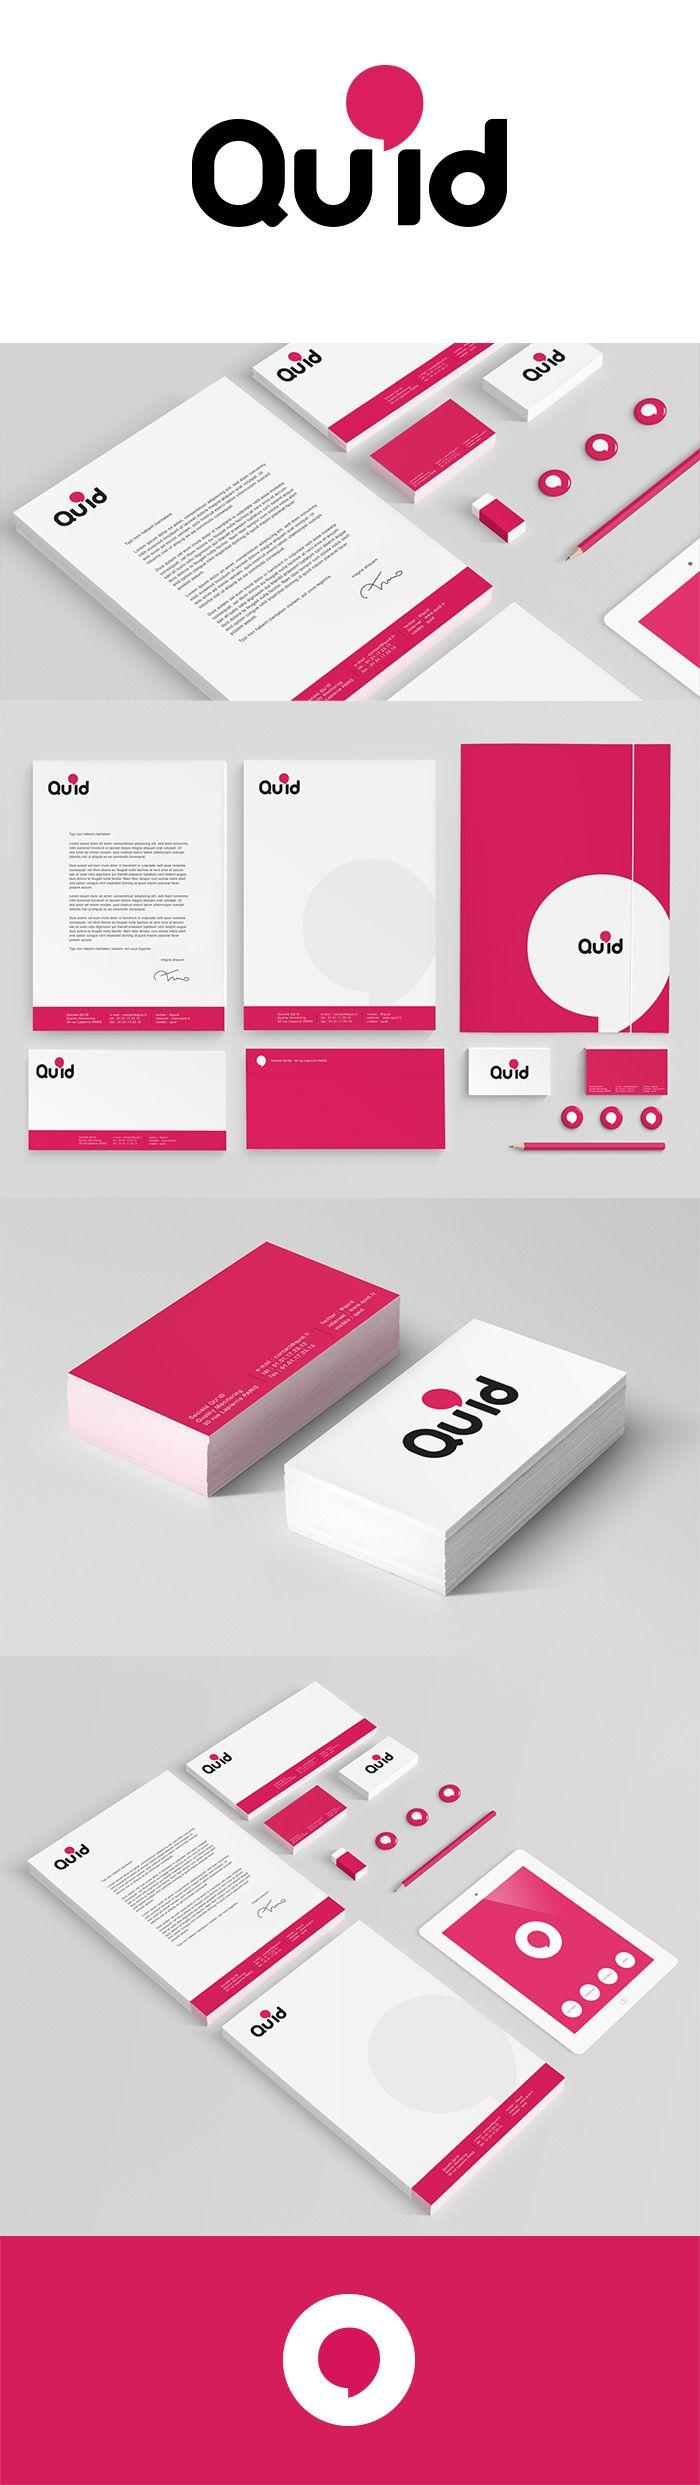 QU'ID #logo #identity #design #corporate #branding par Nicolas LEONARD #graphiste #graphistefreelance #illustrateur